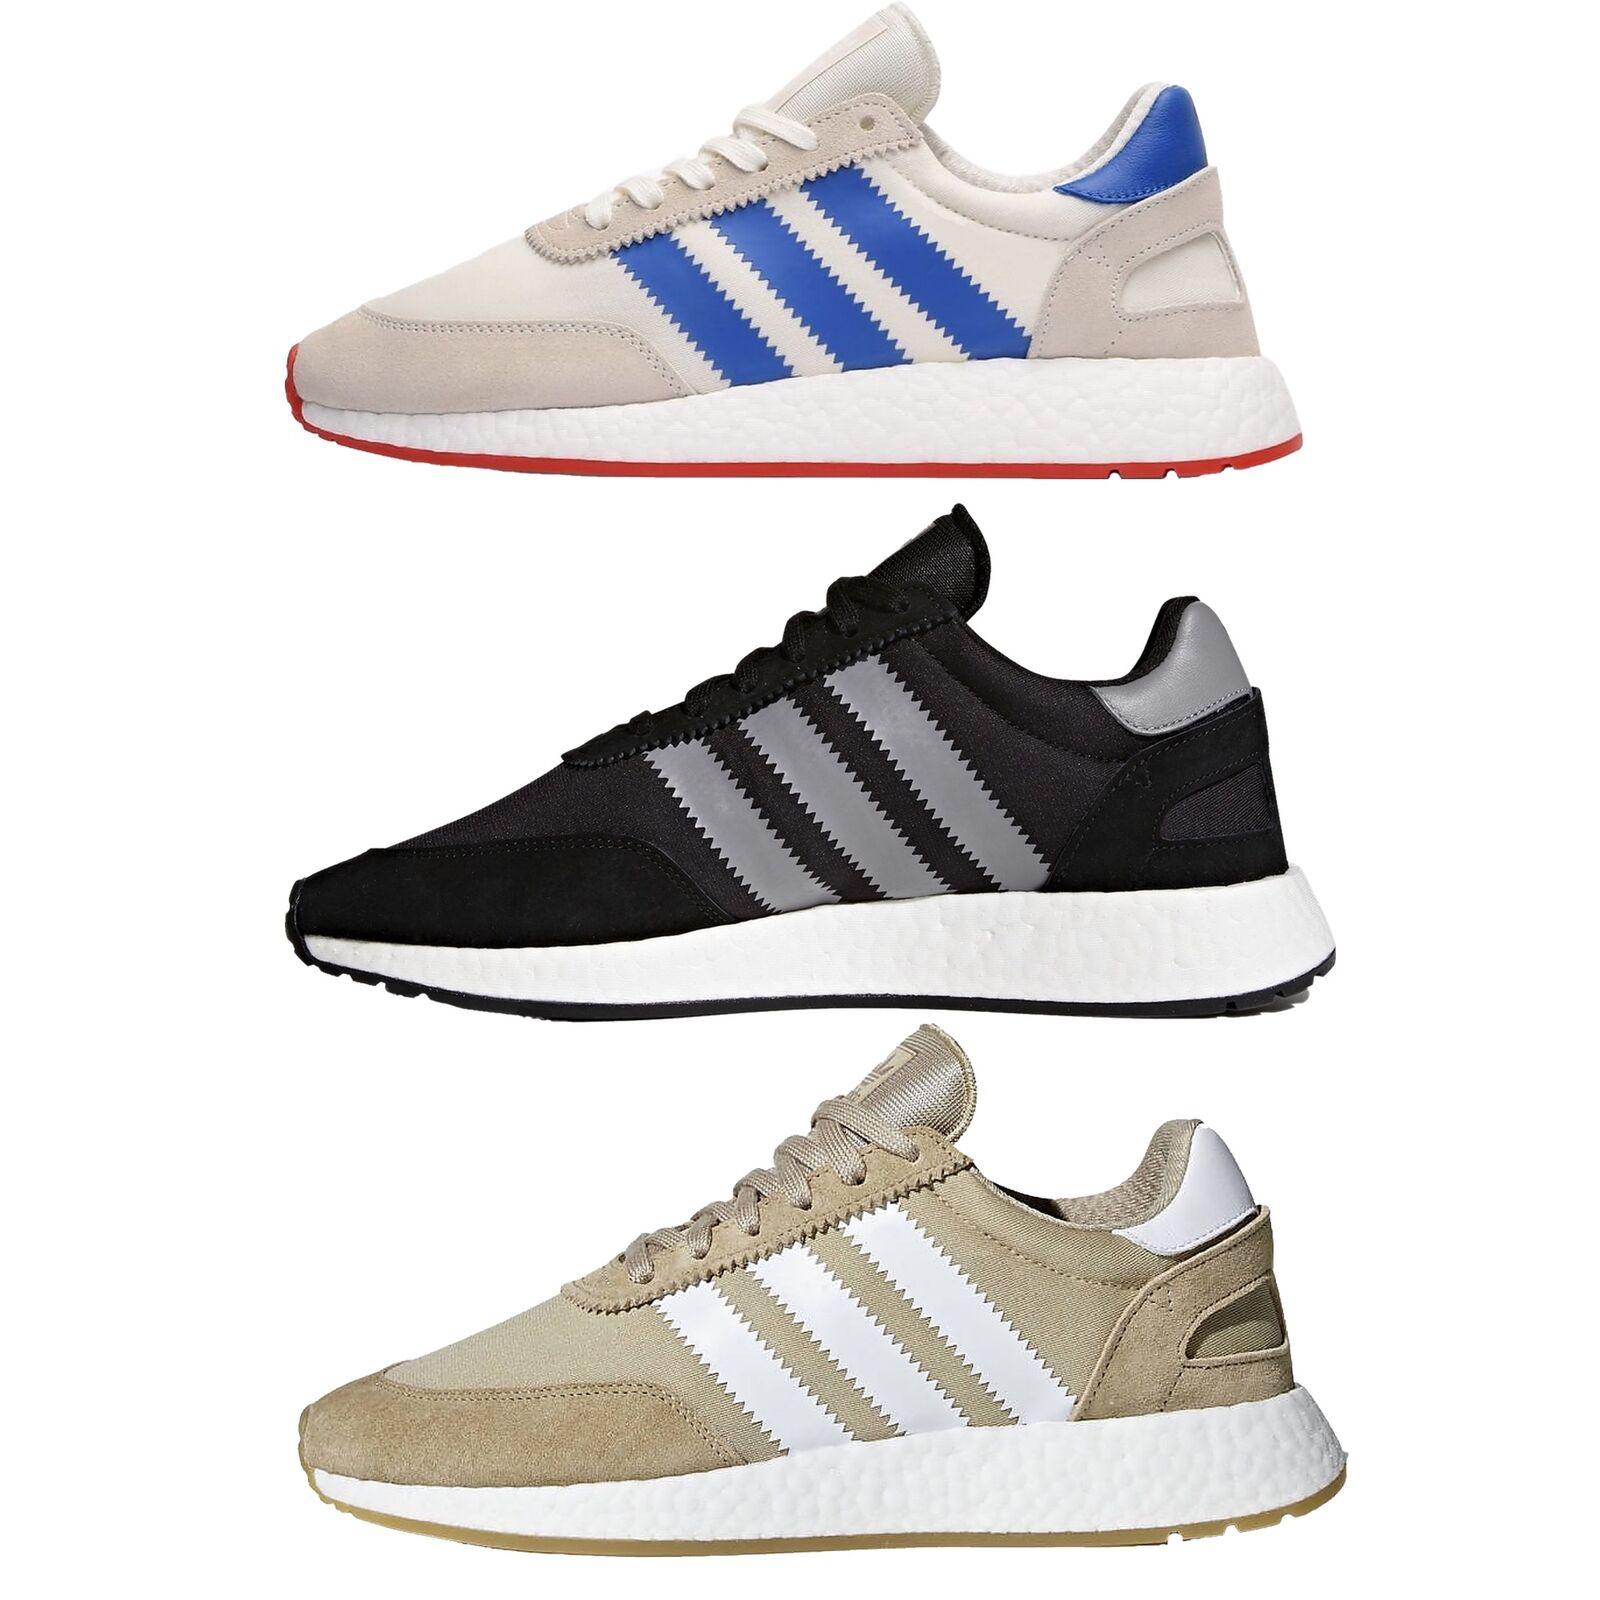 adidas Originals I5923 Unisex Herren Damen Schuhe Turnschuhe Sportschuhe Boost